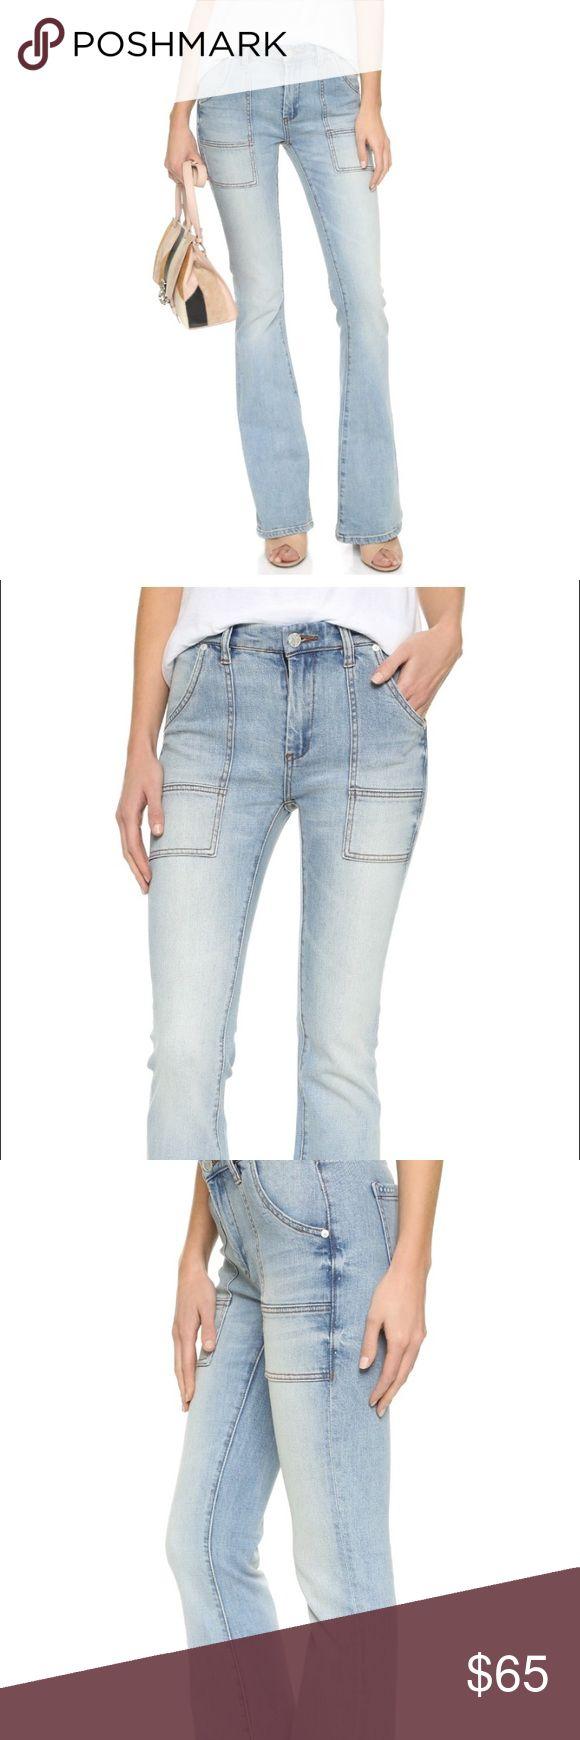 "Blank Denim Flare Jeans NYC by Shopbop Brand new with tags Blank Denim NYC Flare Jean in faded wash ""secret box"" in size 30. Blank Denim Jeans Flare & Wide Leg"